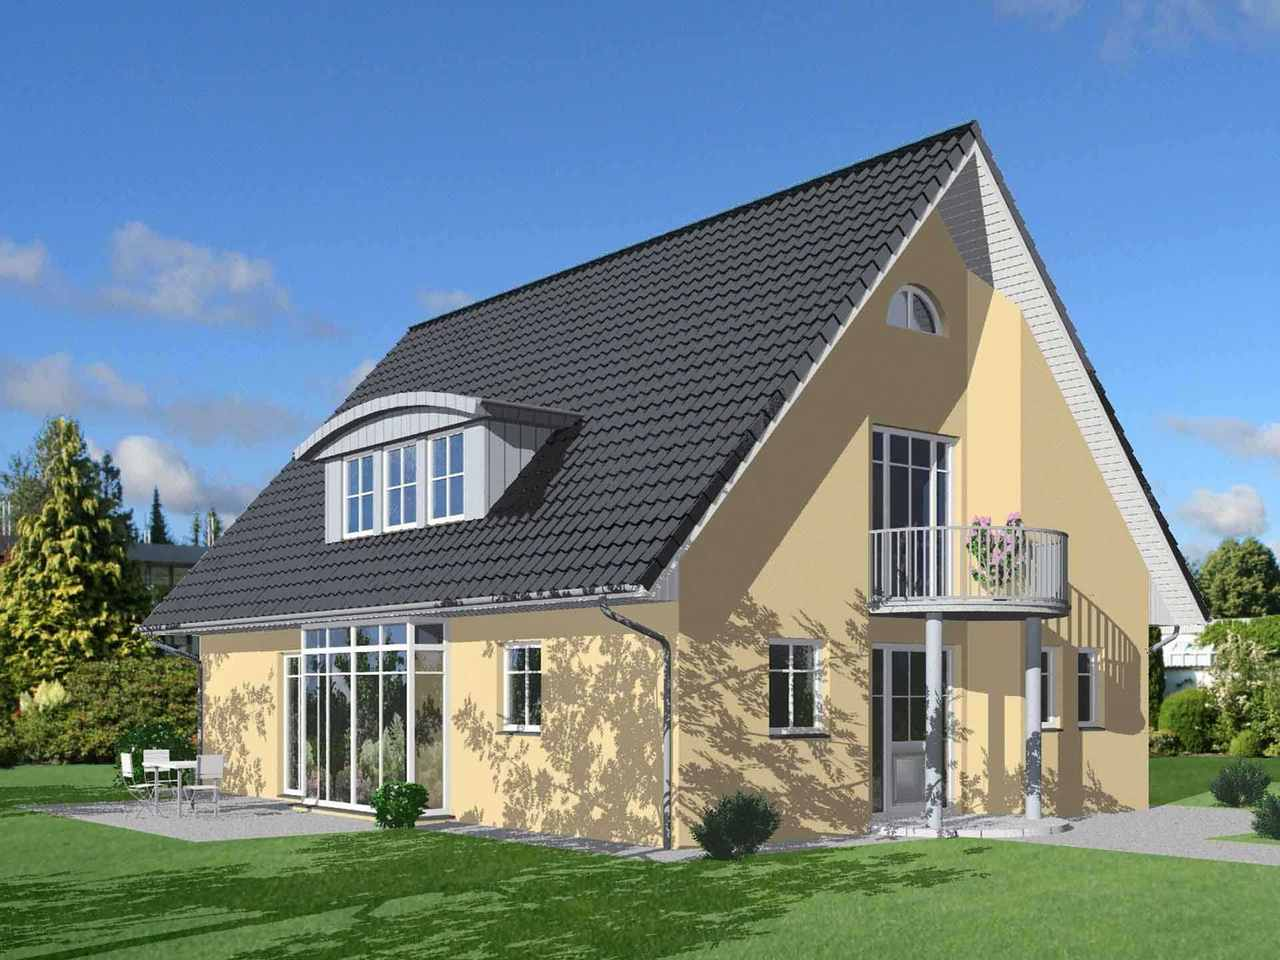 Einfamilienhaus Madrid - OLFA-Haus GmbH